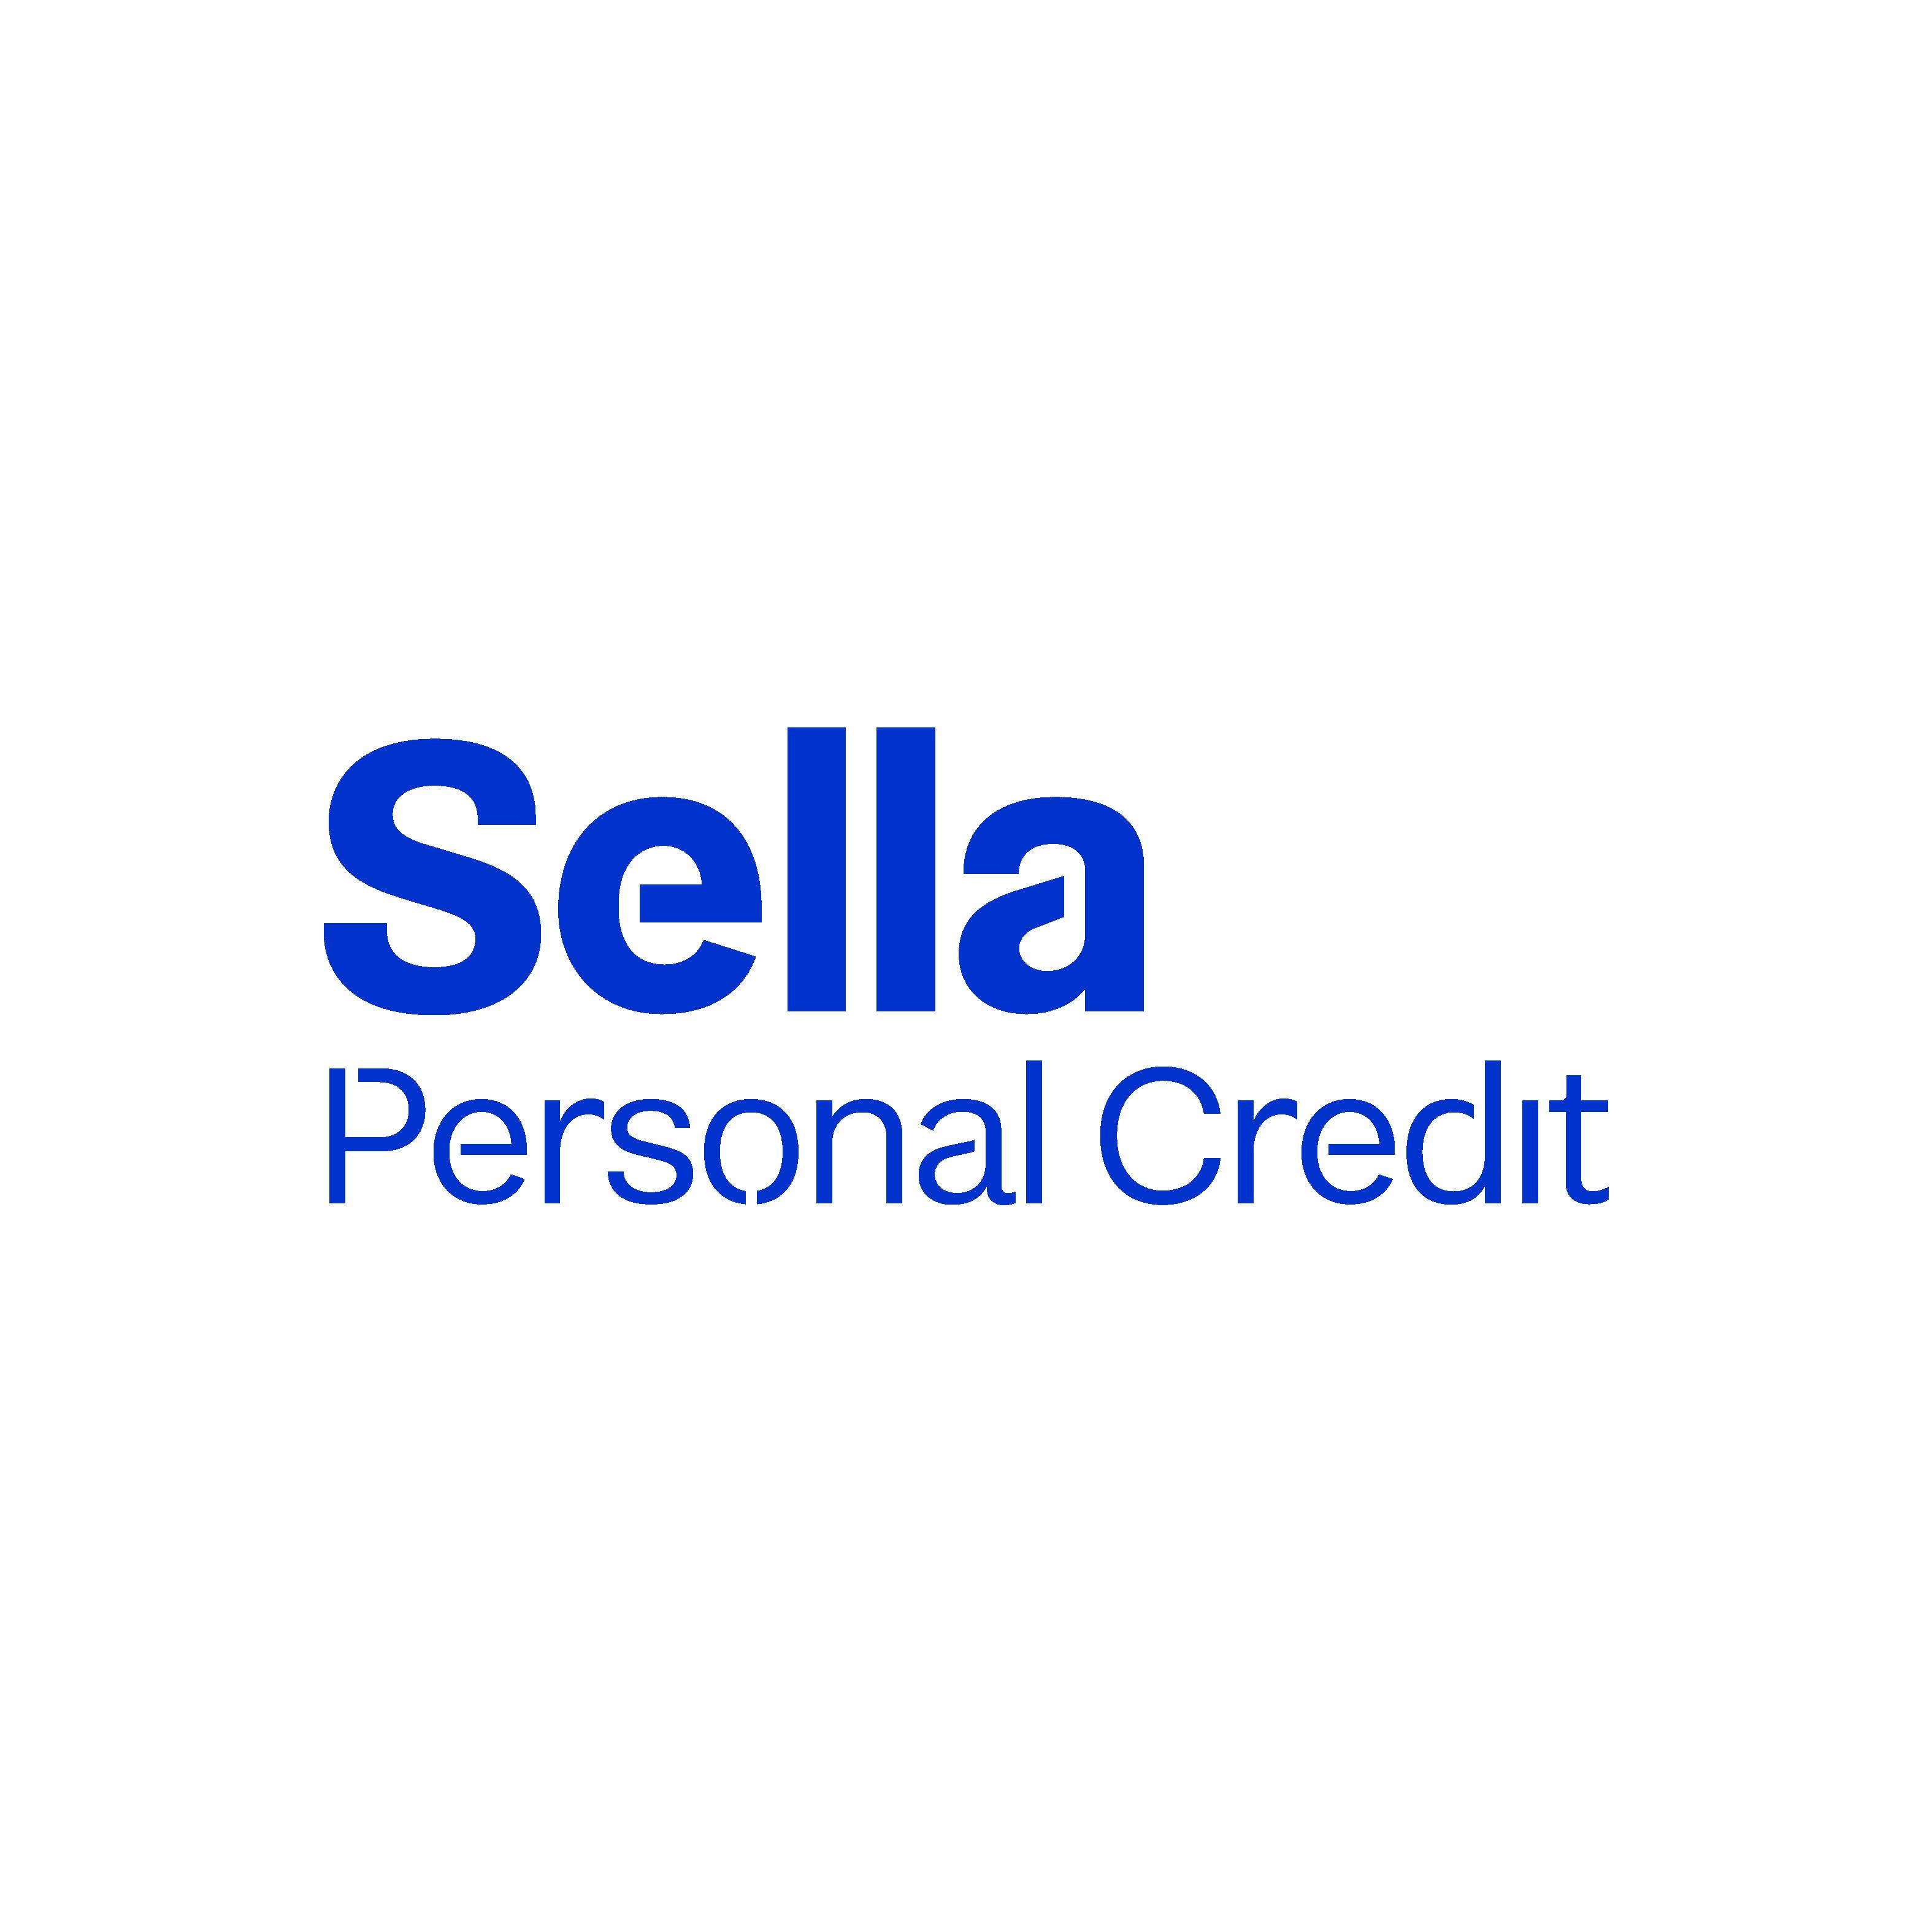 sella-personal-credit